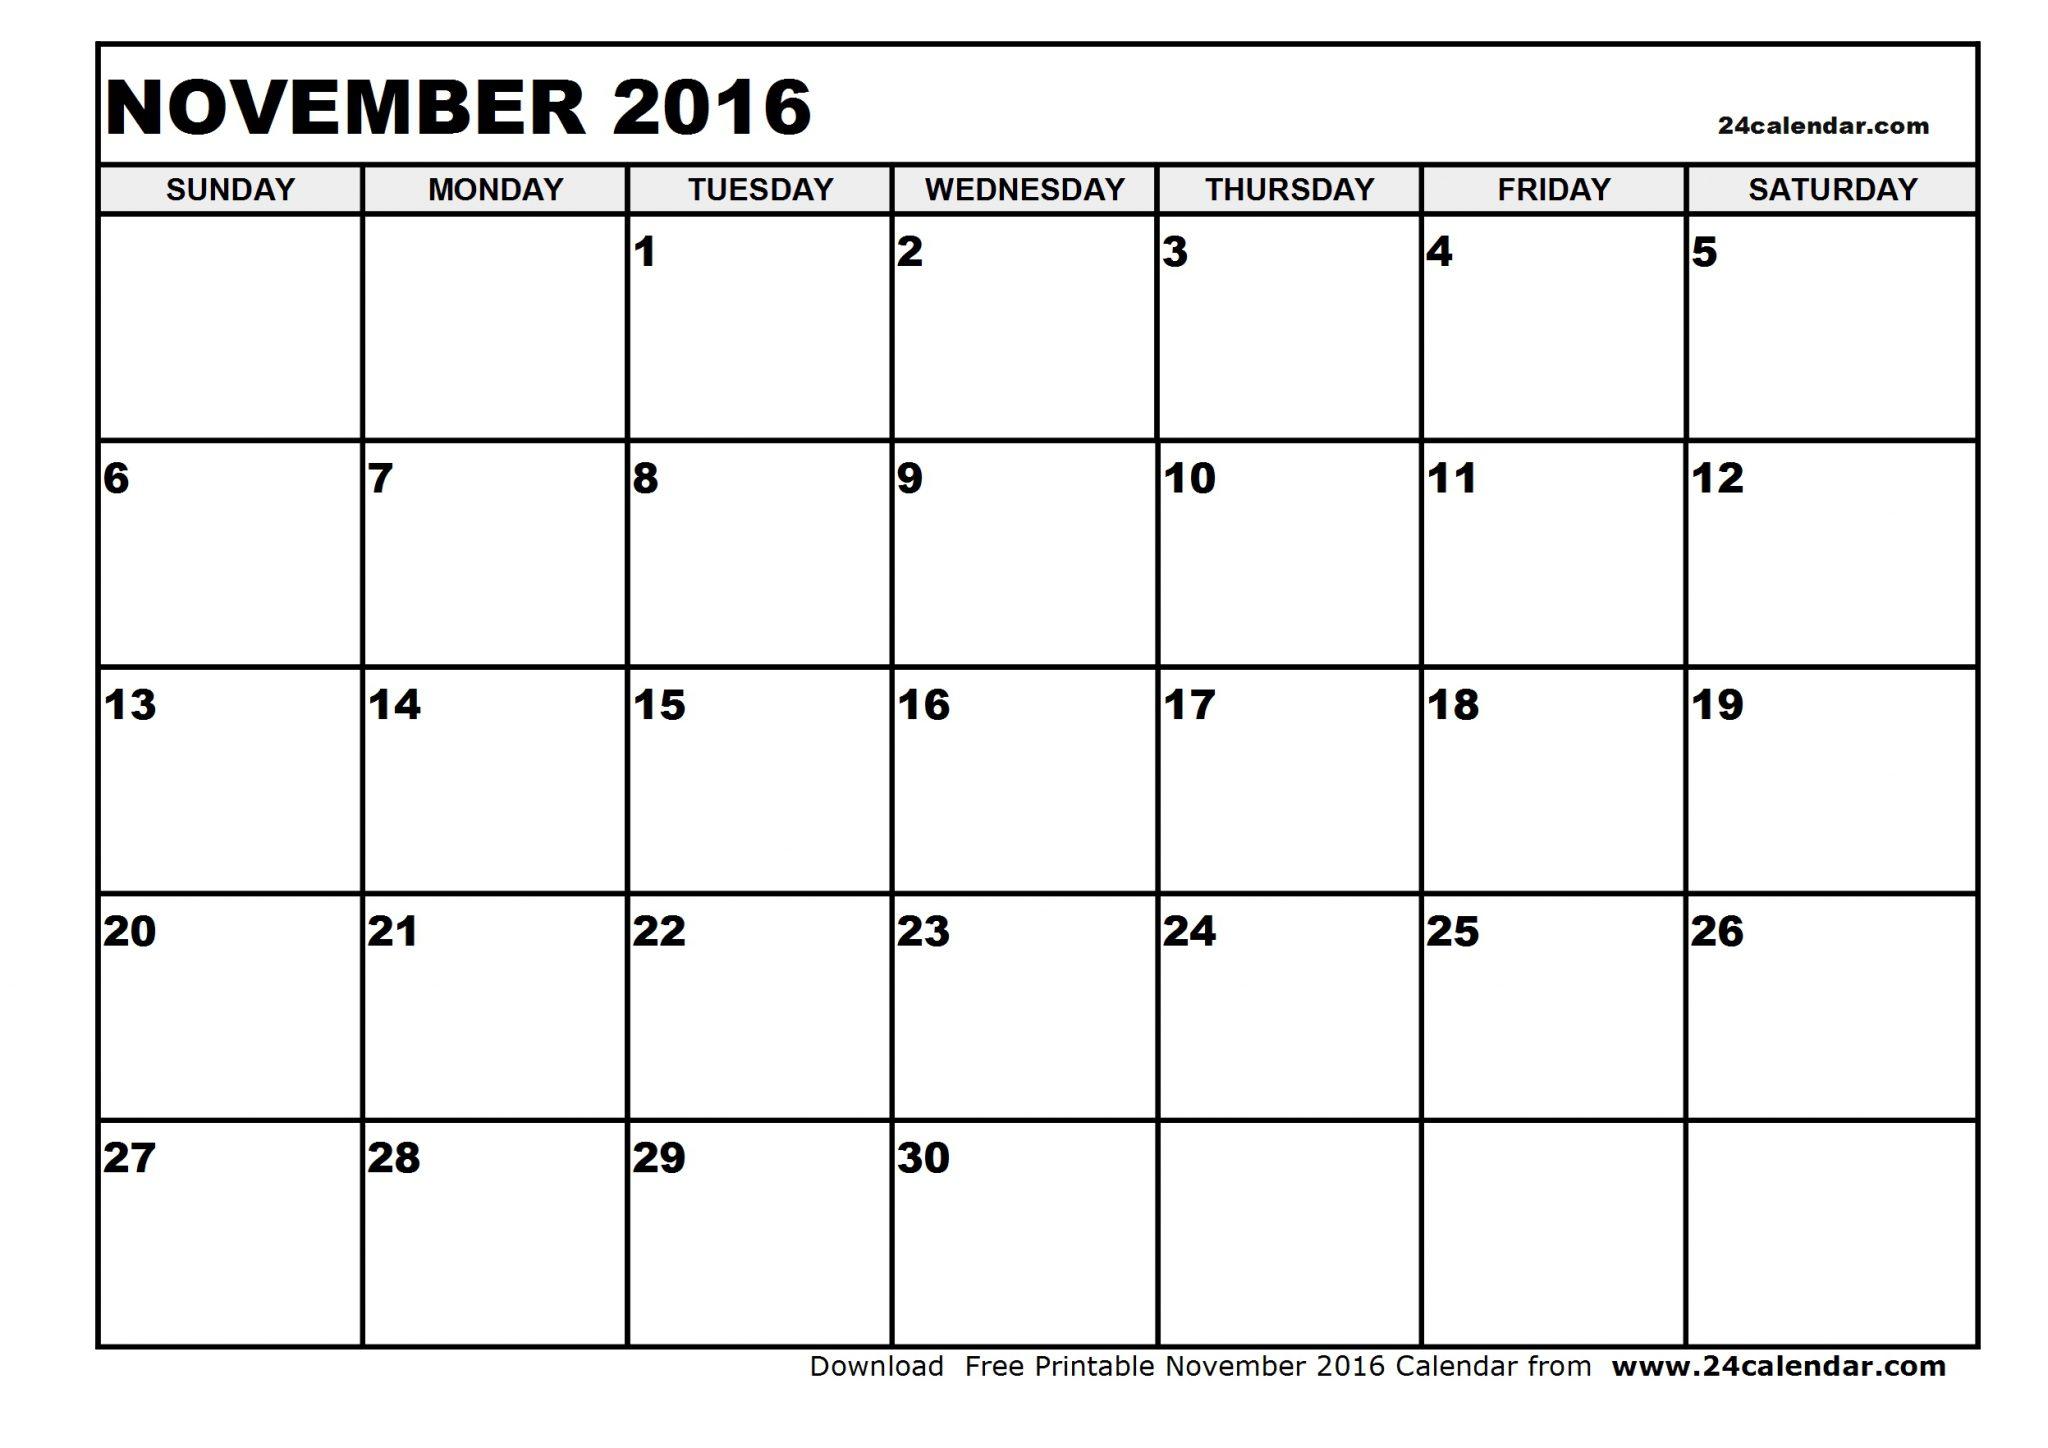 November 2016 Calendar PDF